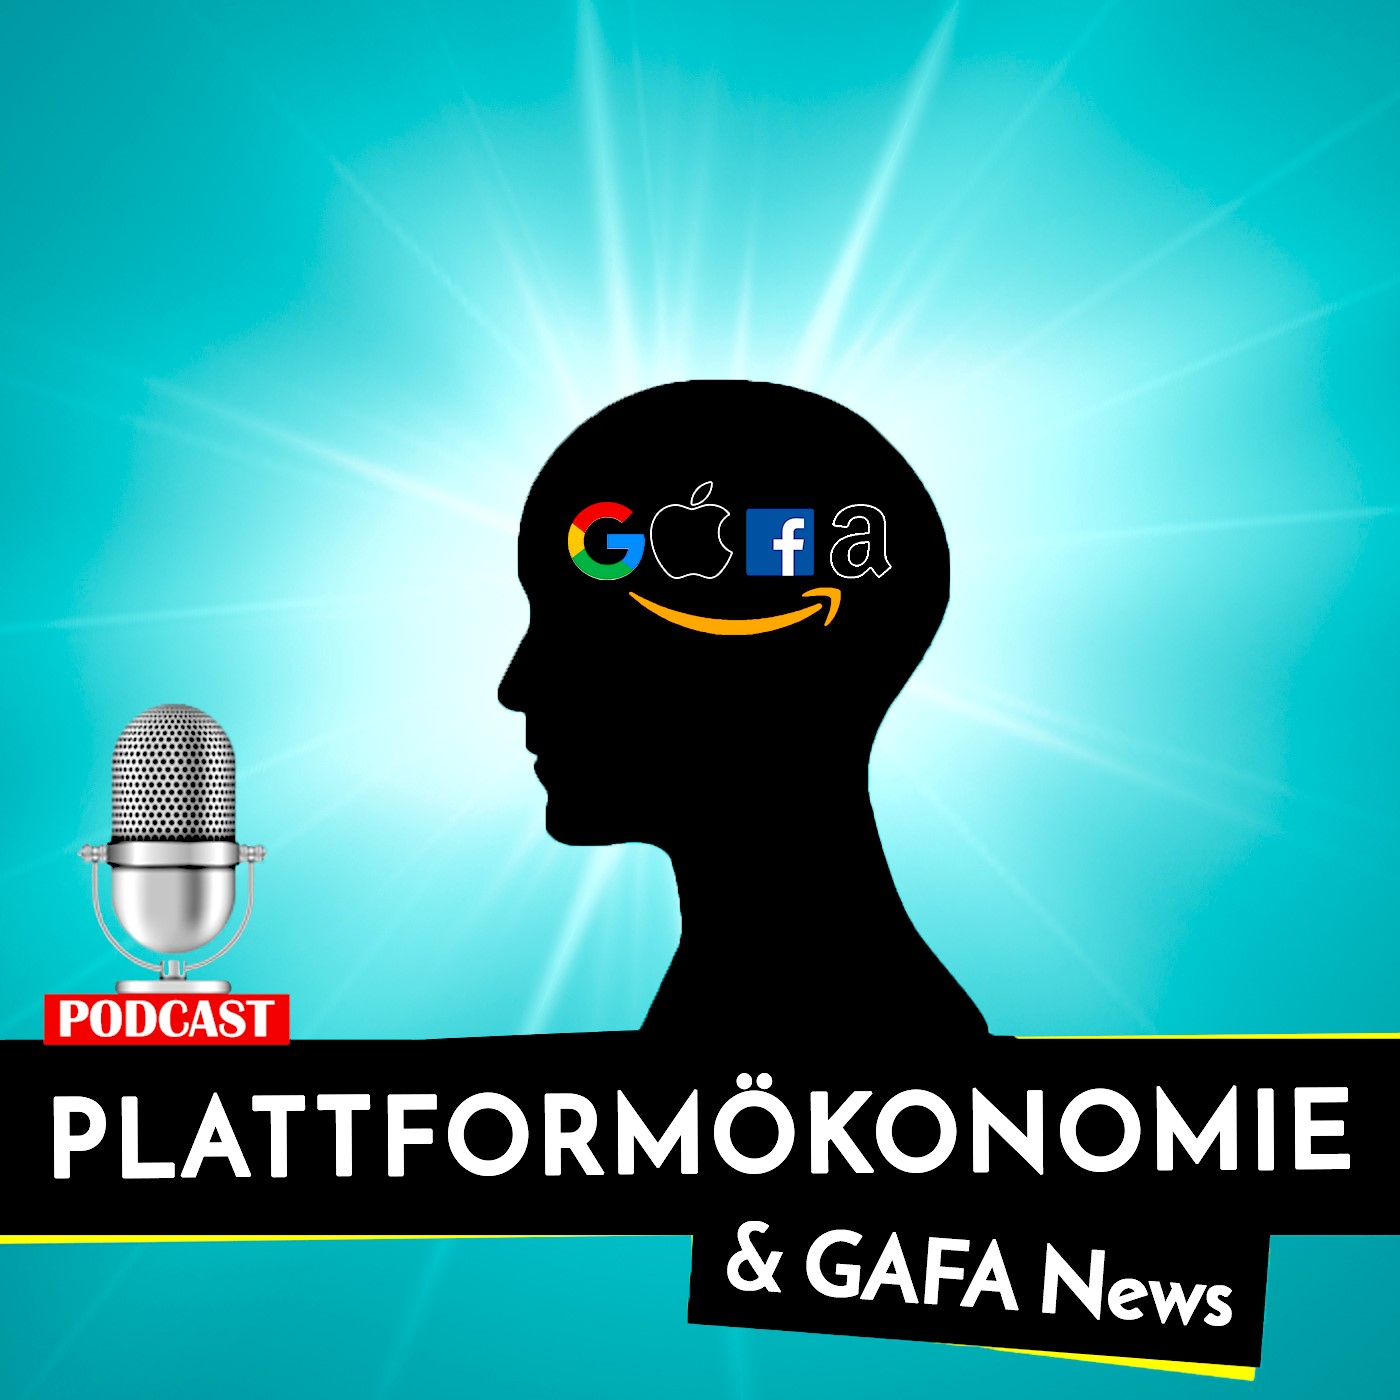 Startup & eCommerce News: Heute: Spotivy, HelloFresh, Shop Aootheke, Effenberg, Netflix...